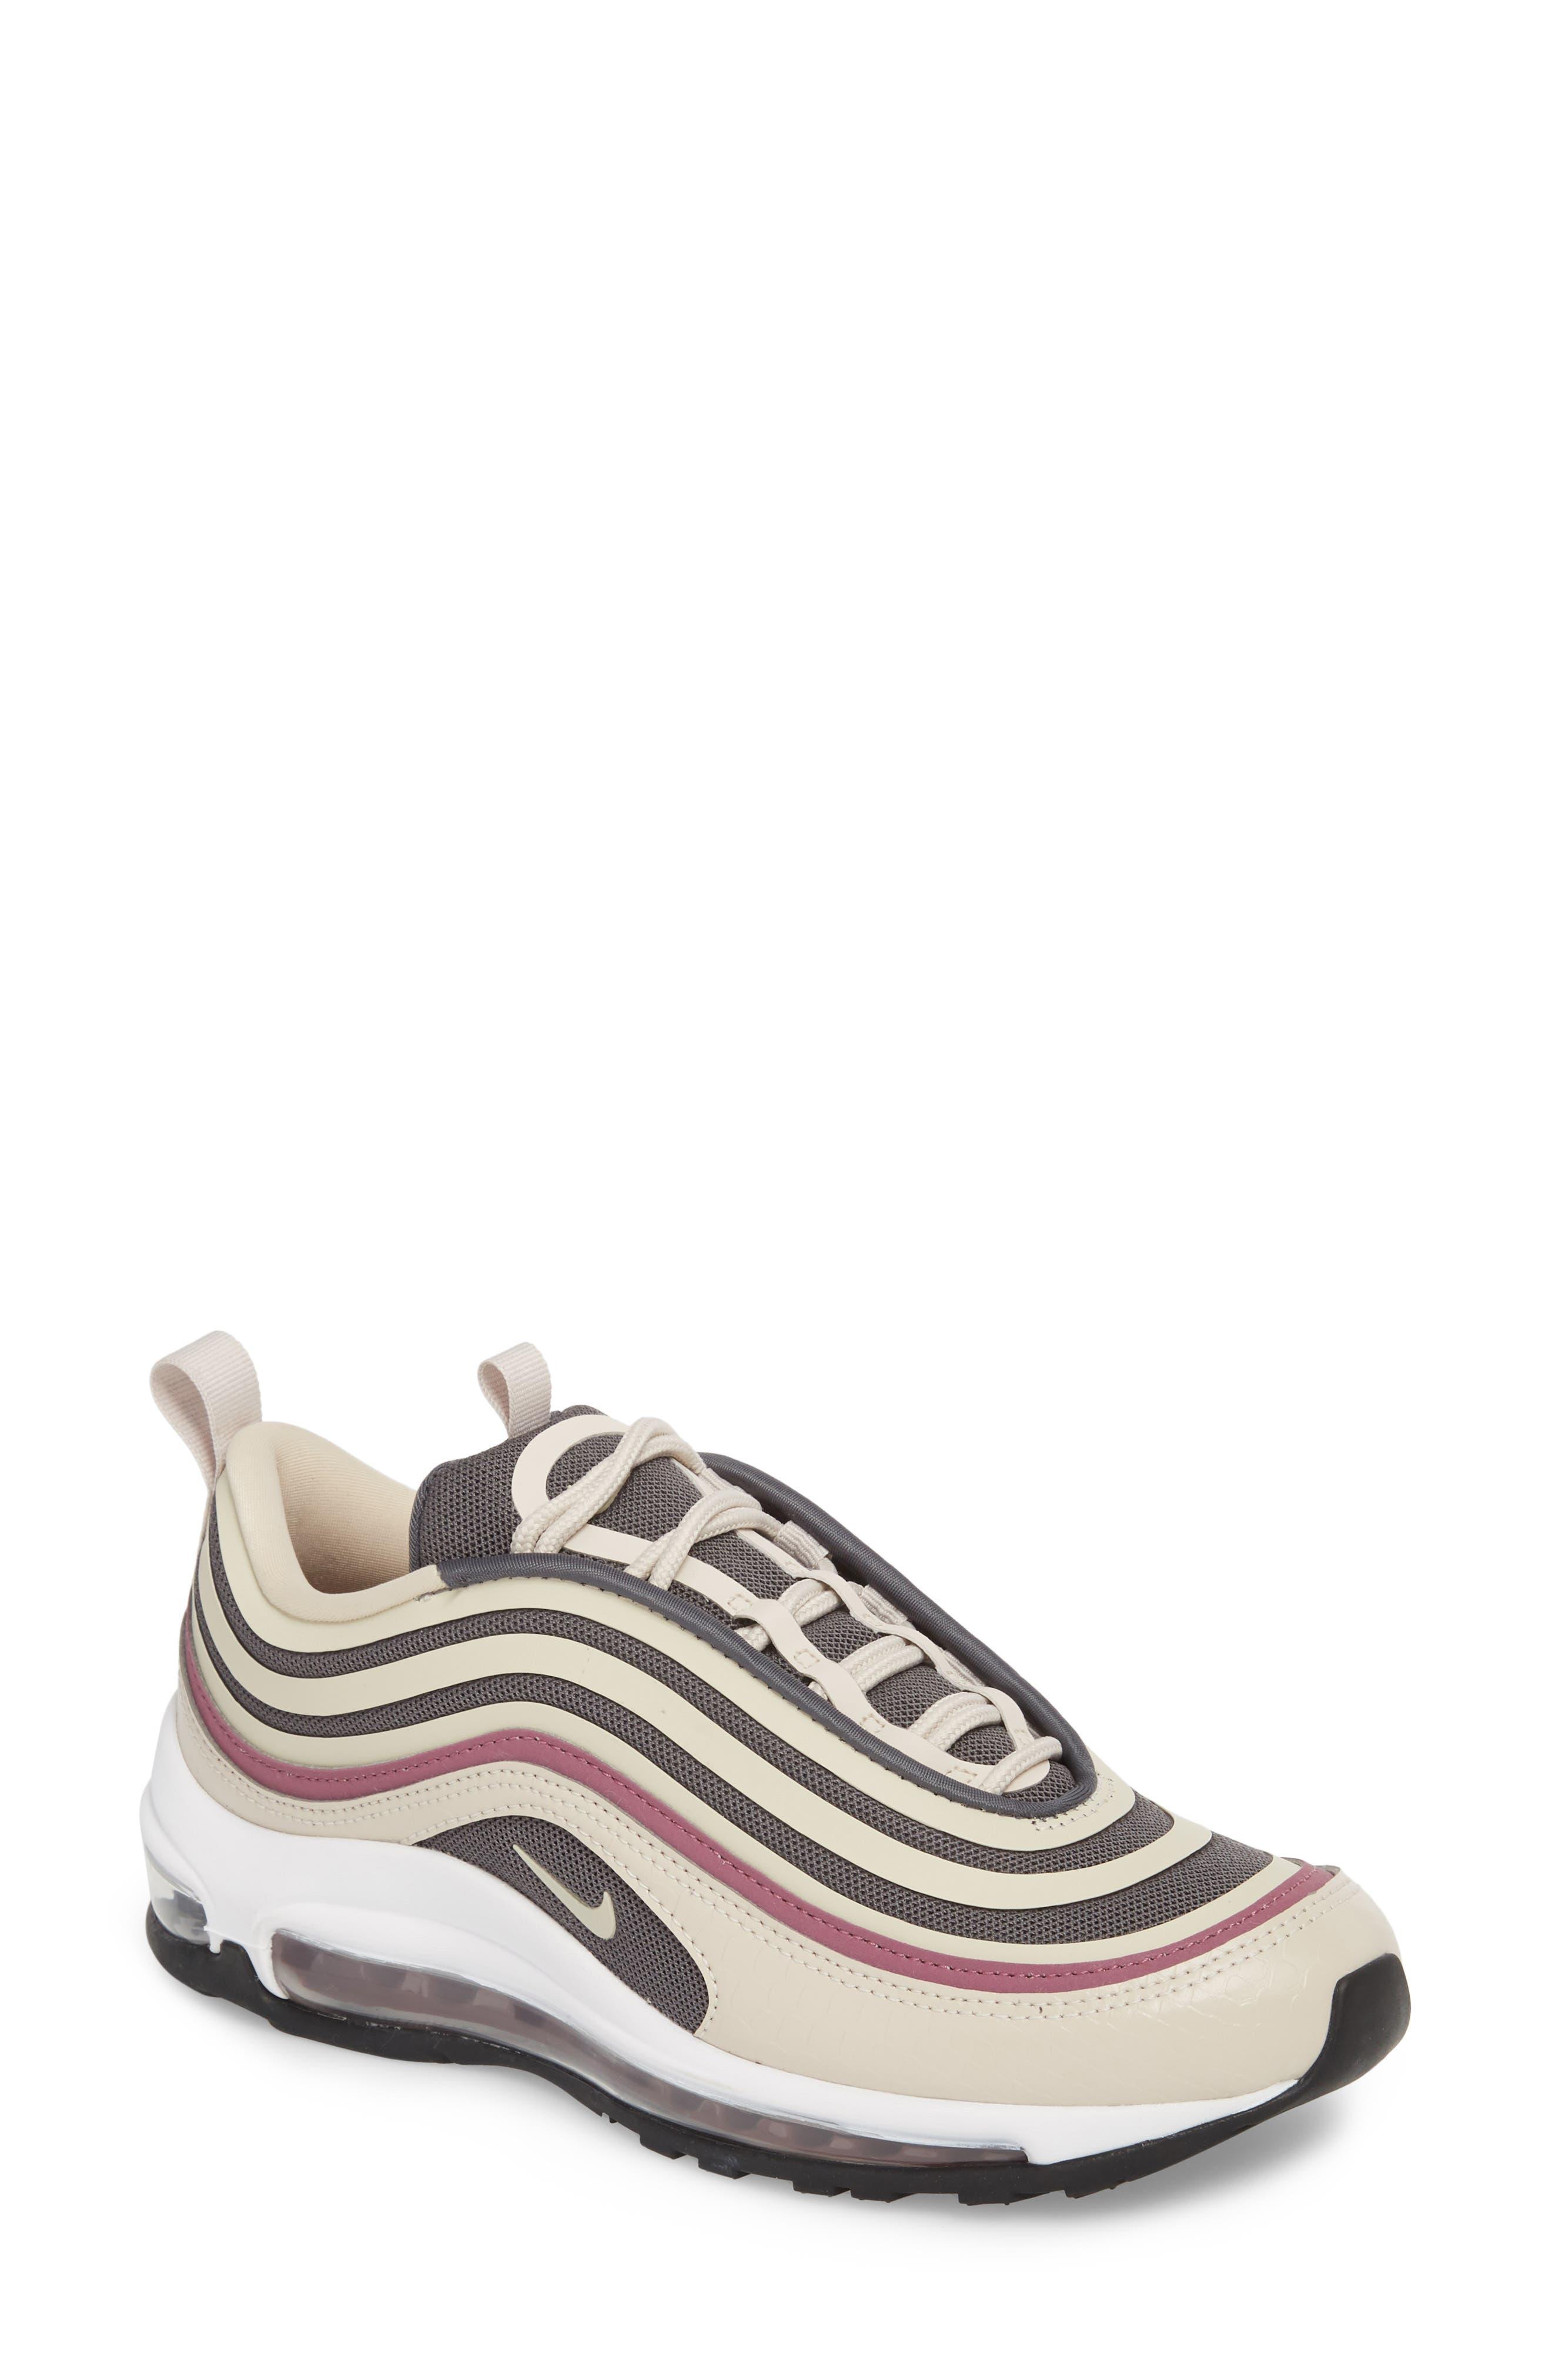 Air Max 97 Ultra '17 SE Sneaker,                             Main thumbnail 7, color,